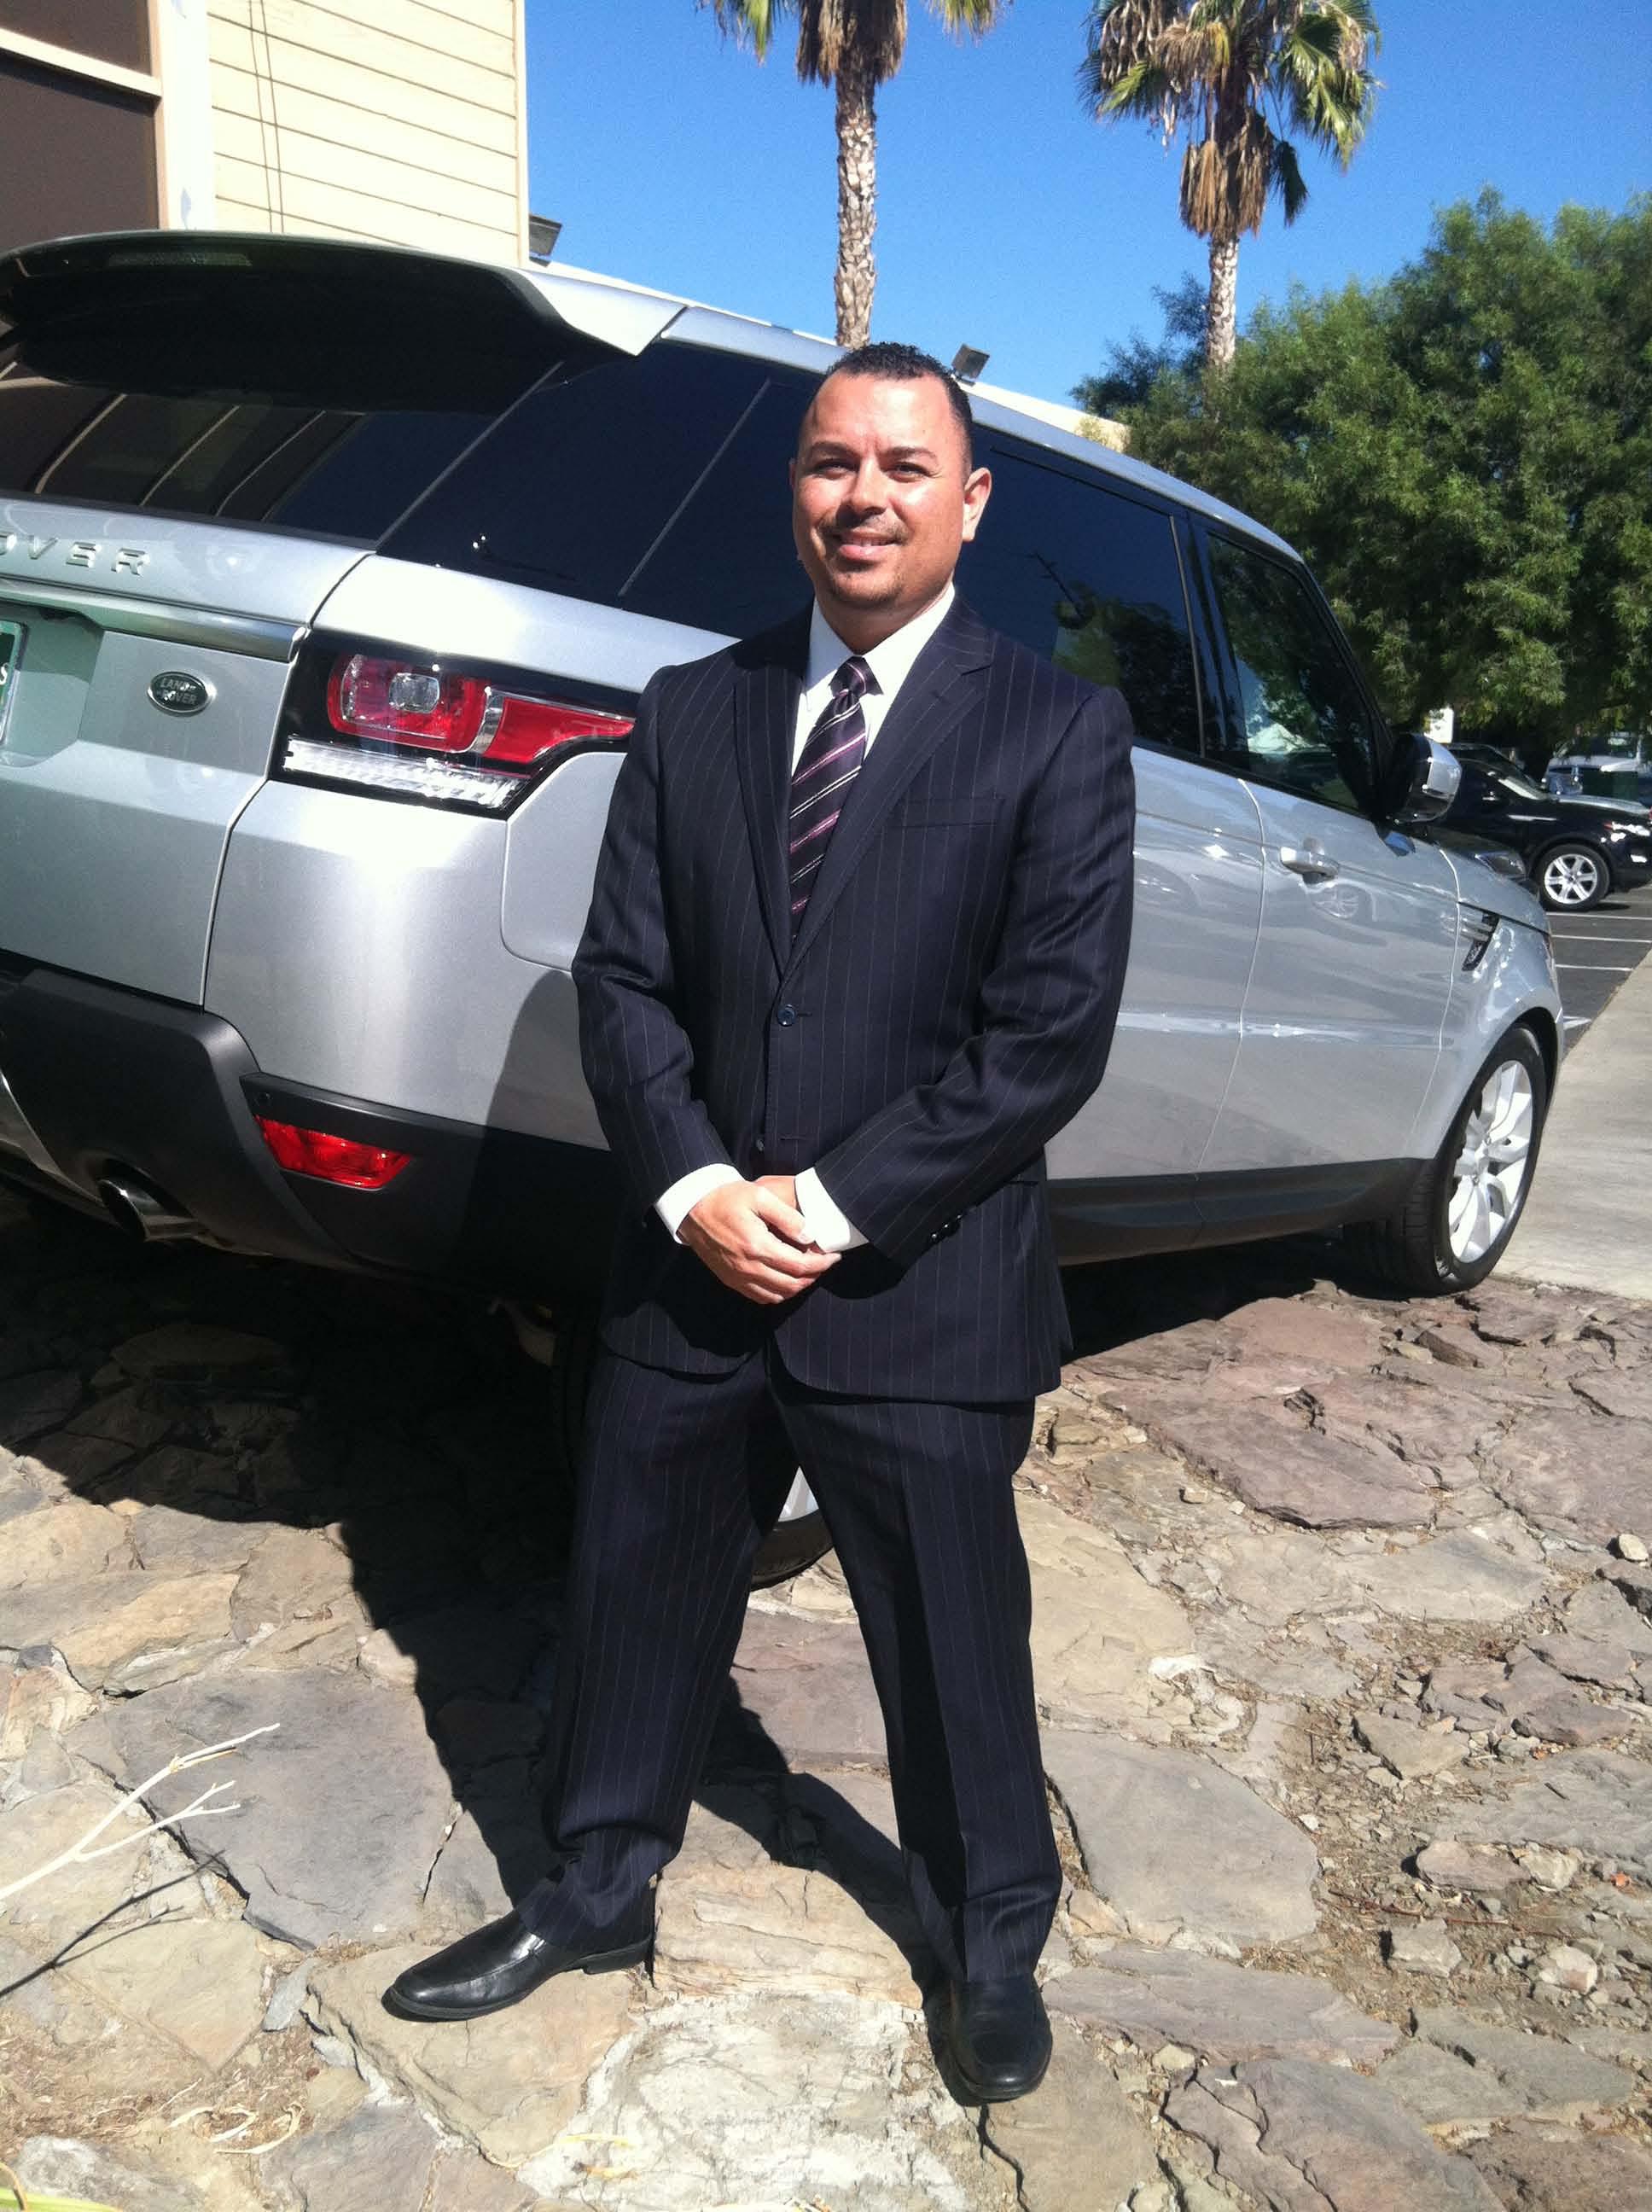 Jeff Assad, Finance Manager At Jaguar Land Rover Anaheim Hills, Captured  The Coveted Marque